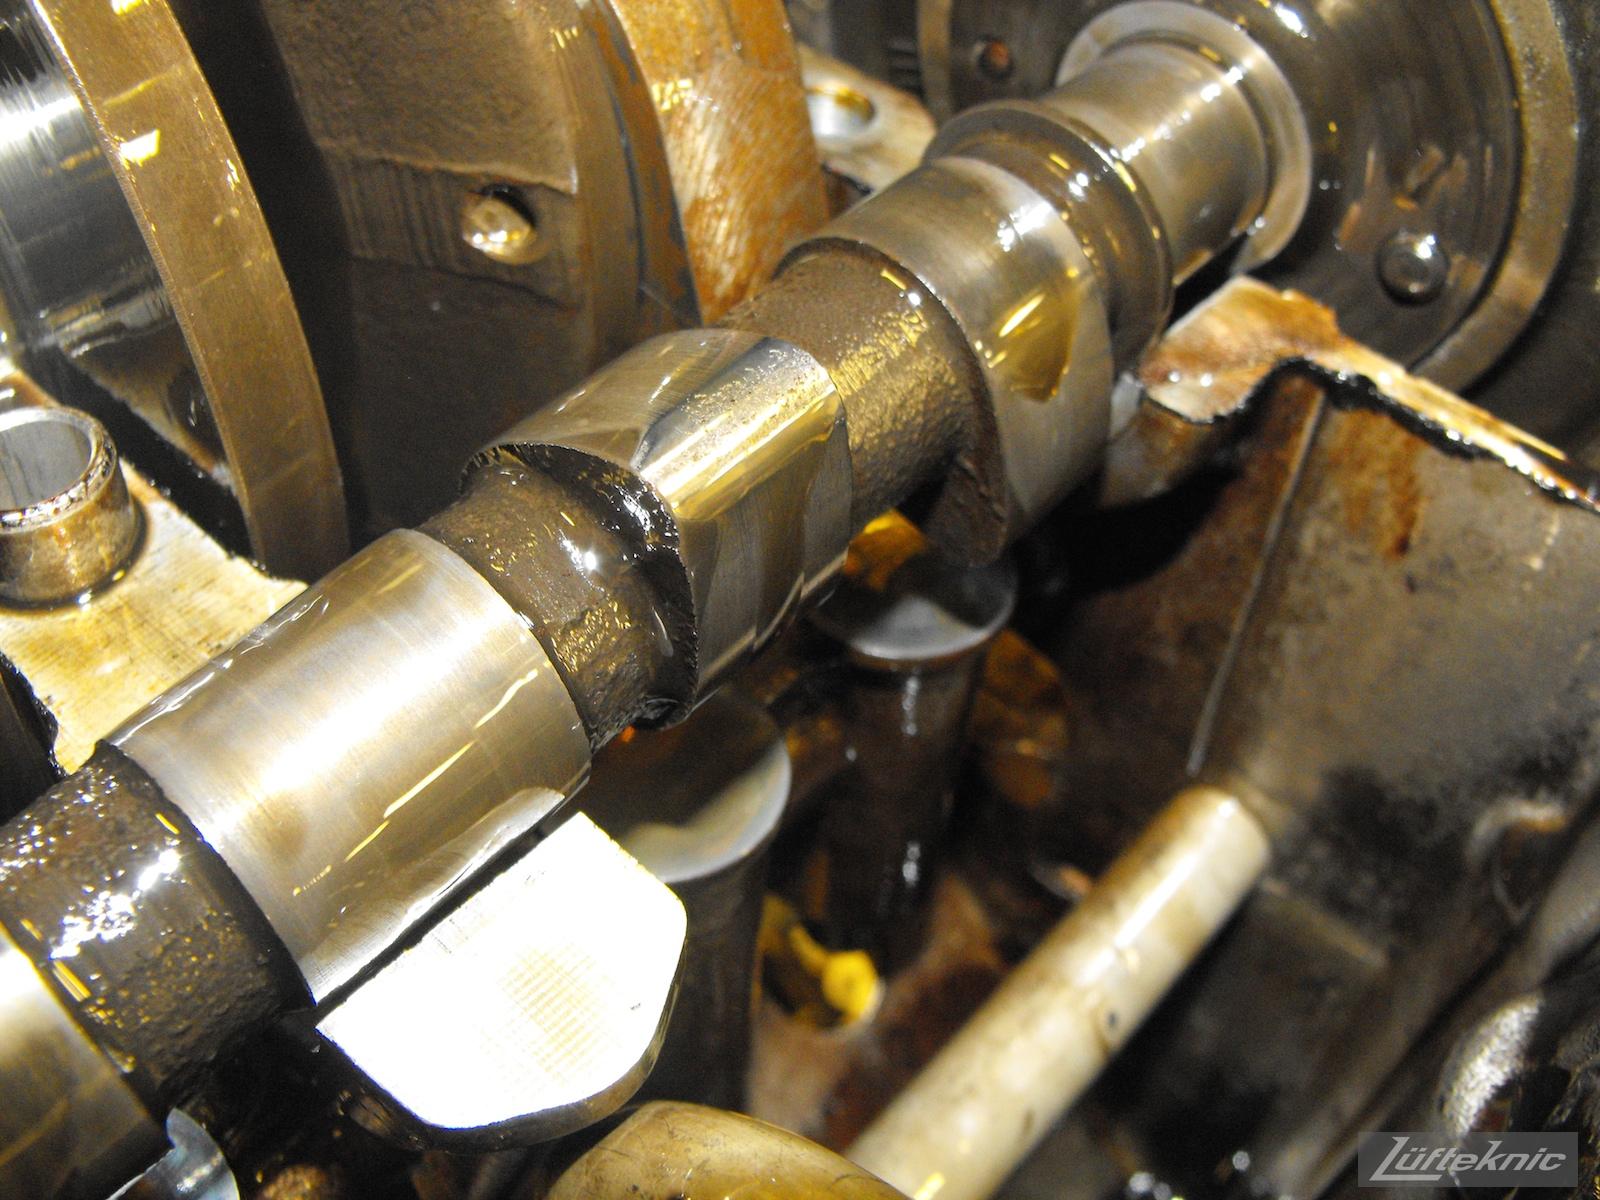 Damaged camshaft lobes from the engine of an Irish Green Porsche 912 undergoing restoration at Lufteknic.